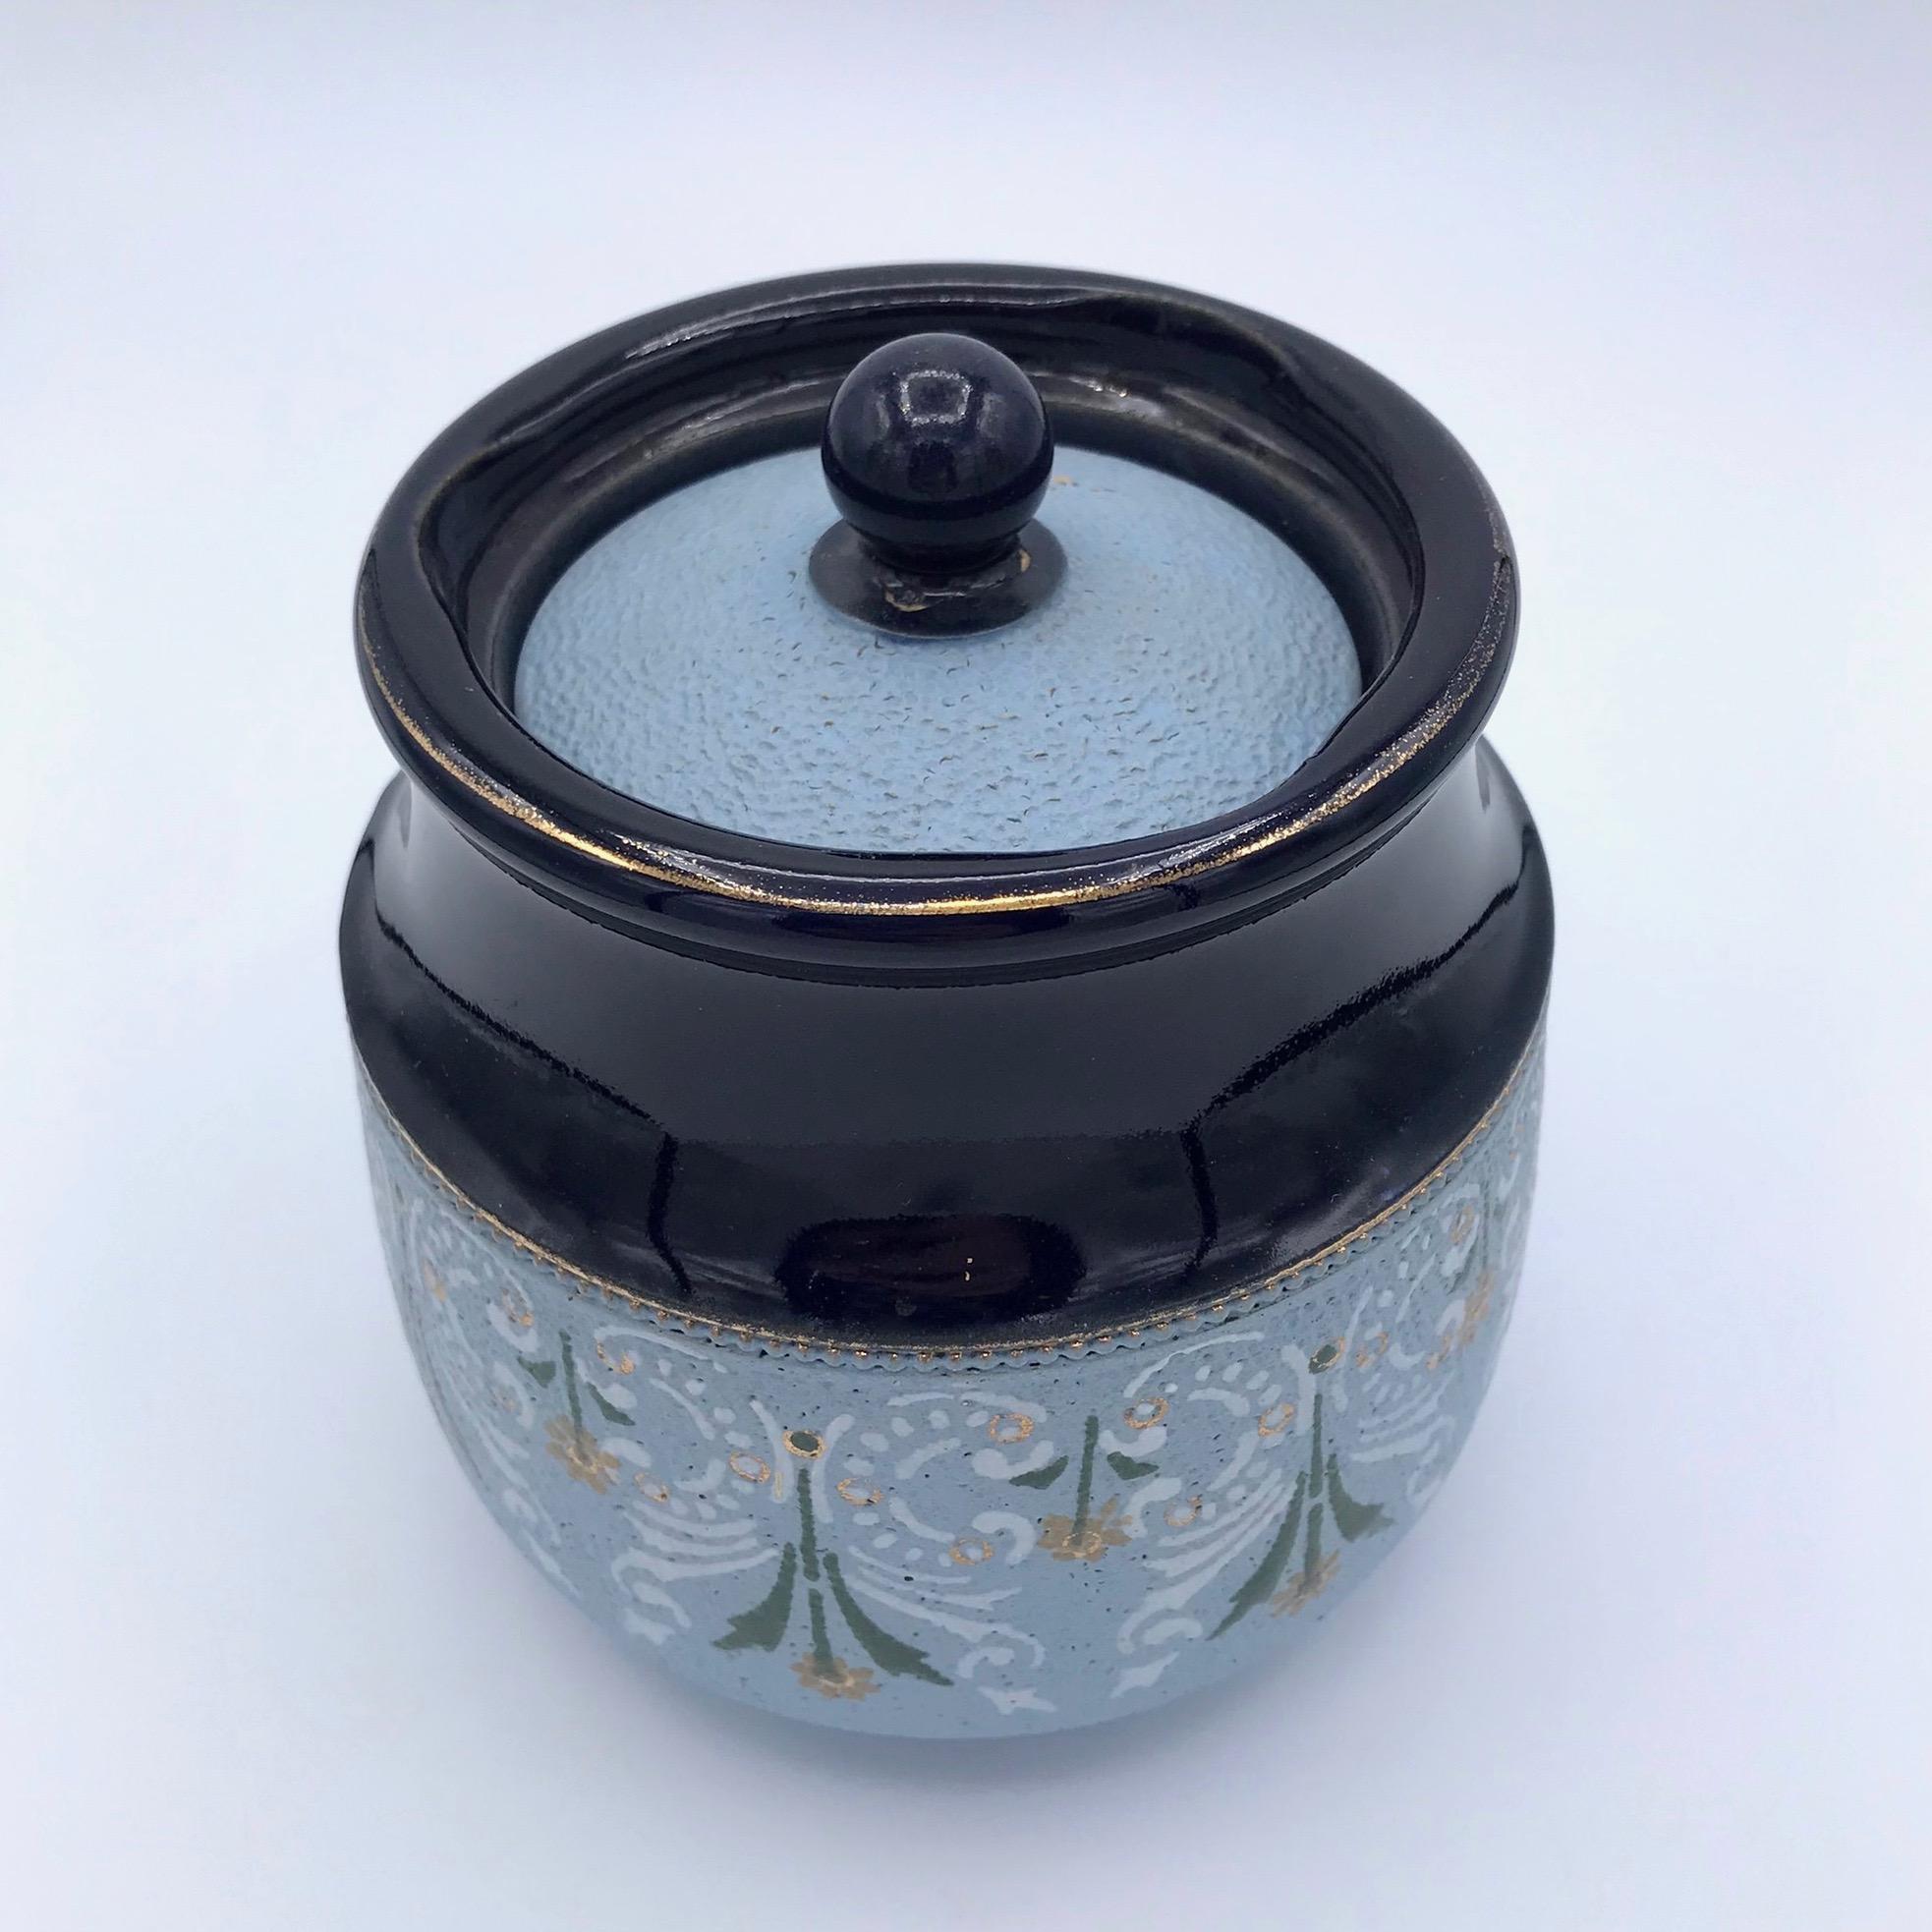 Floral Tobacco Jar